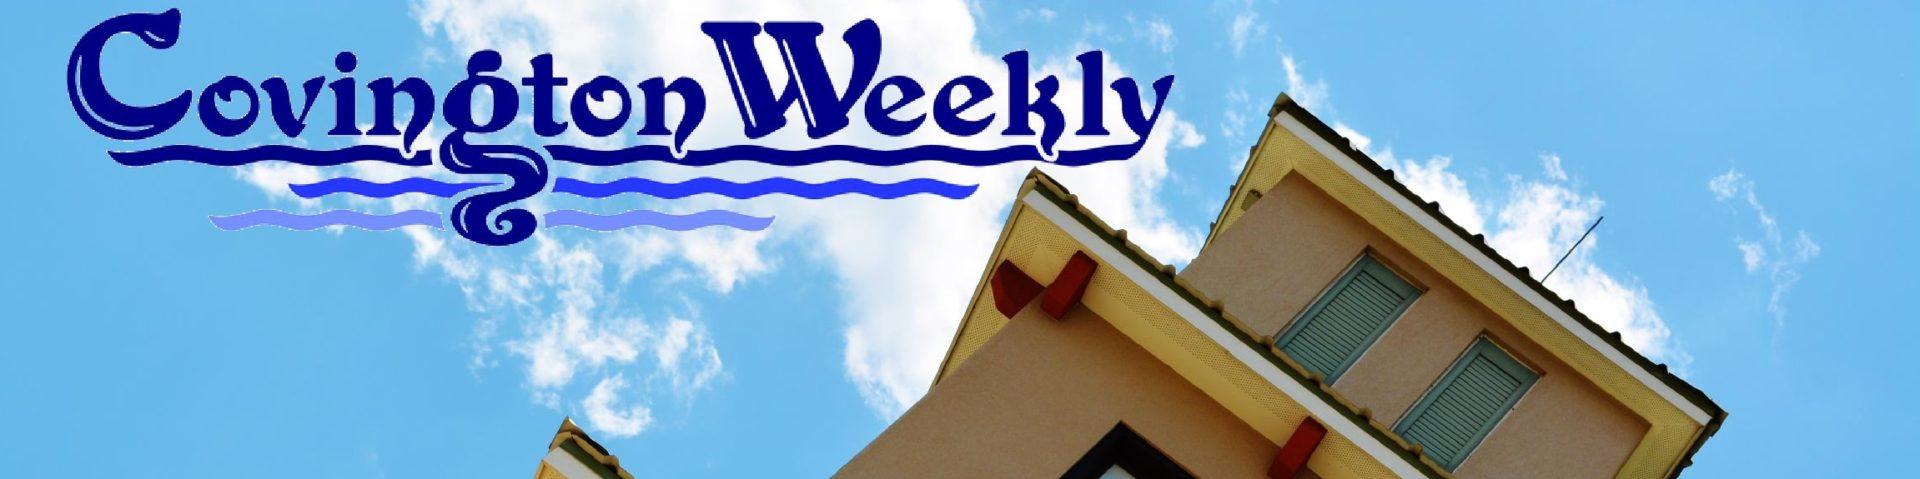 Covington Weekly